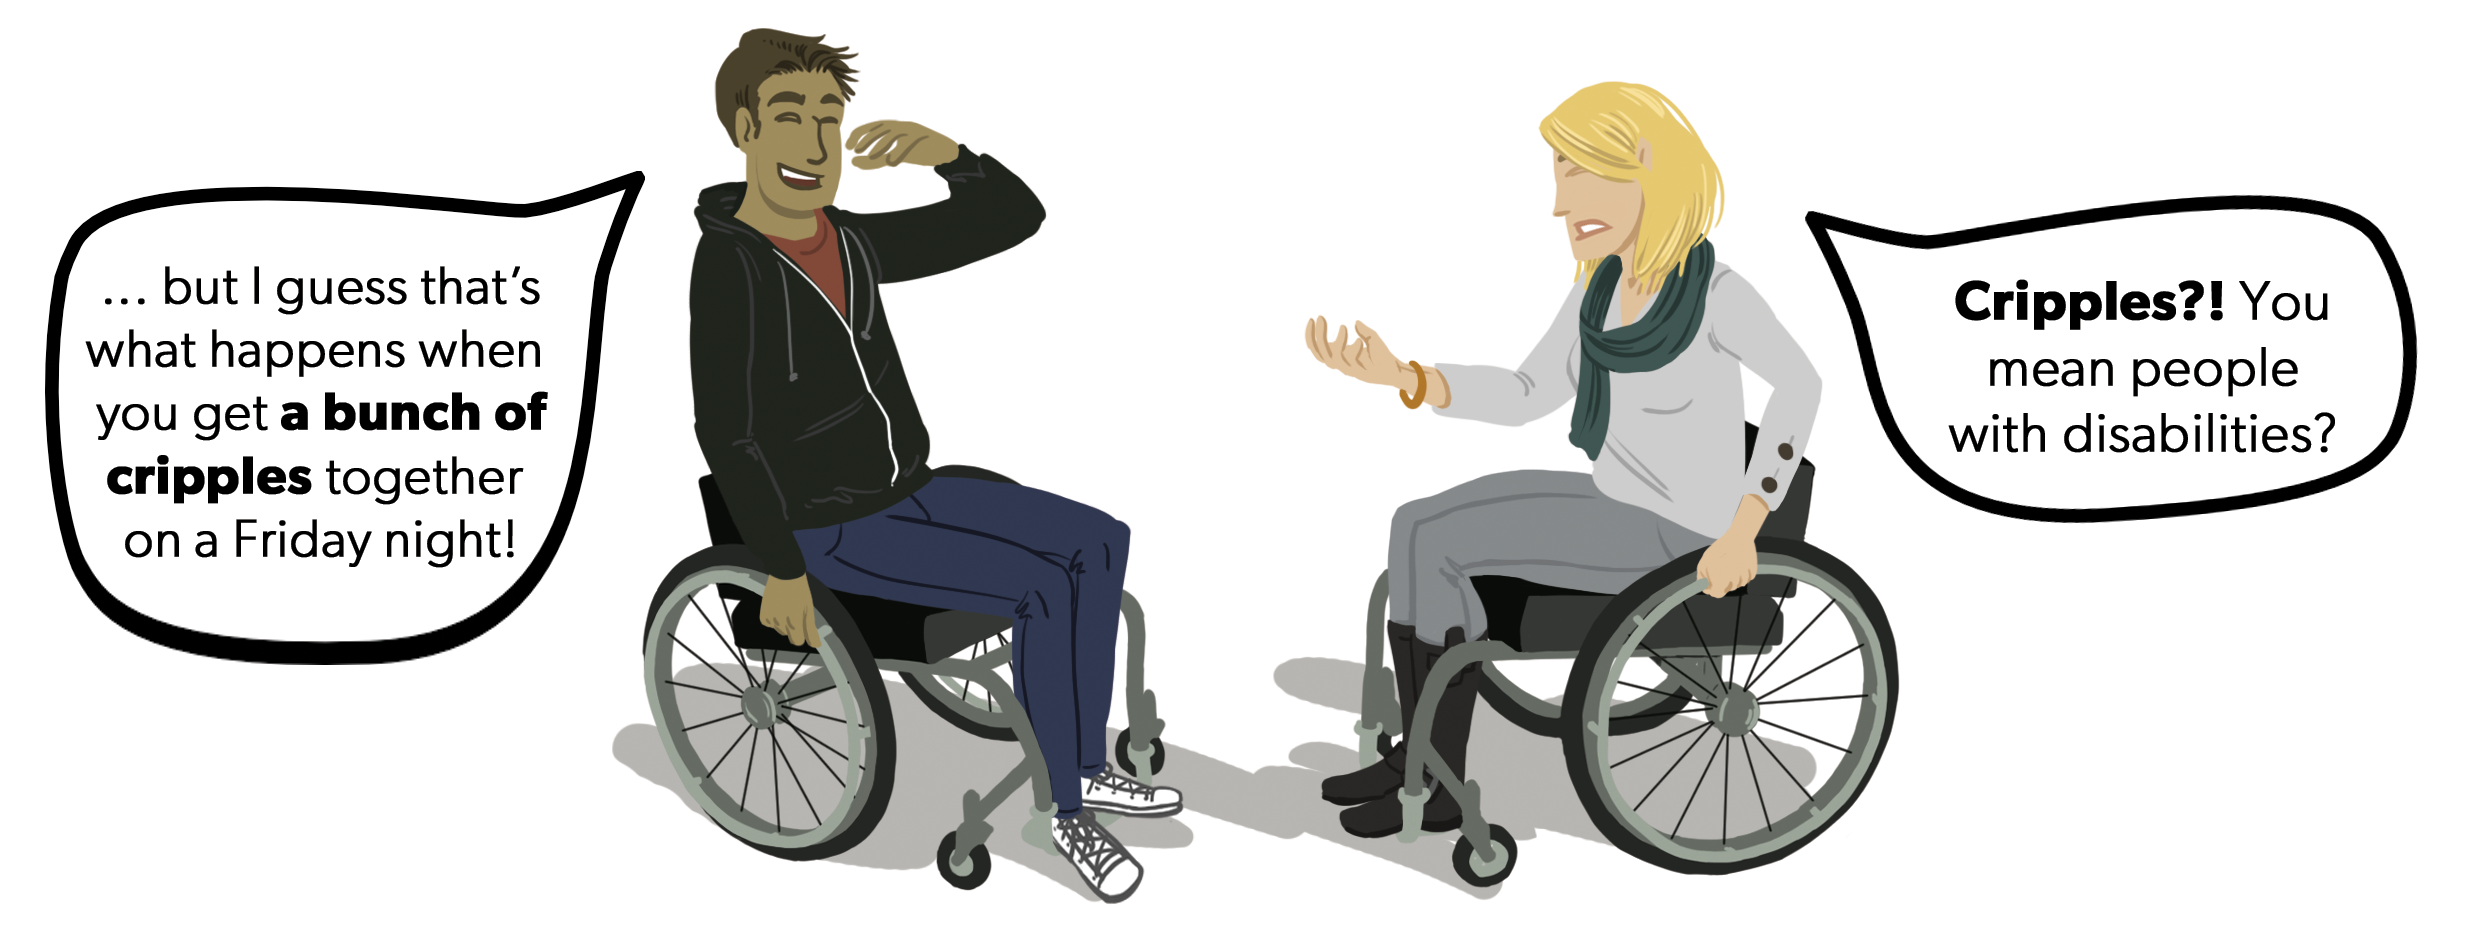 cripples